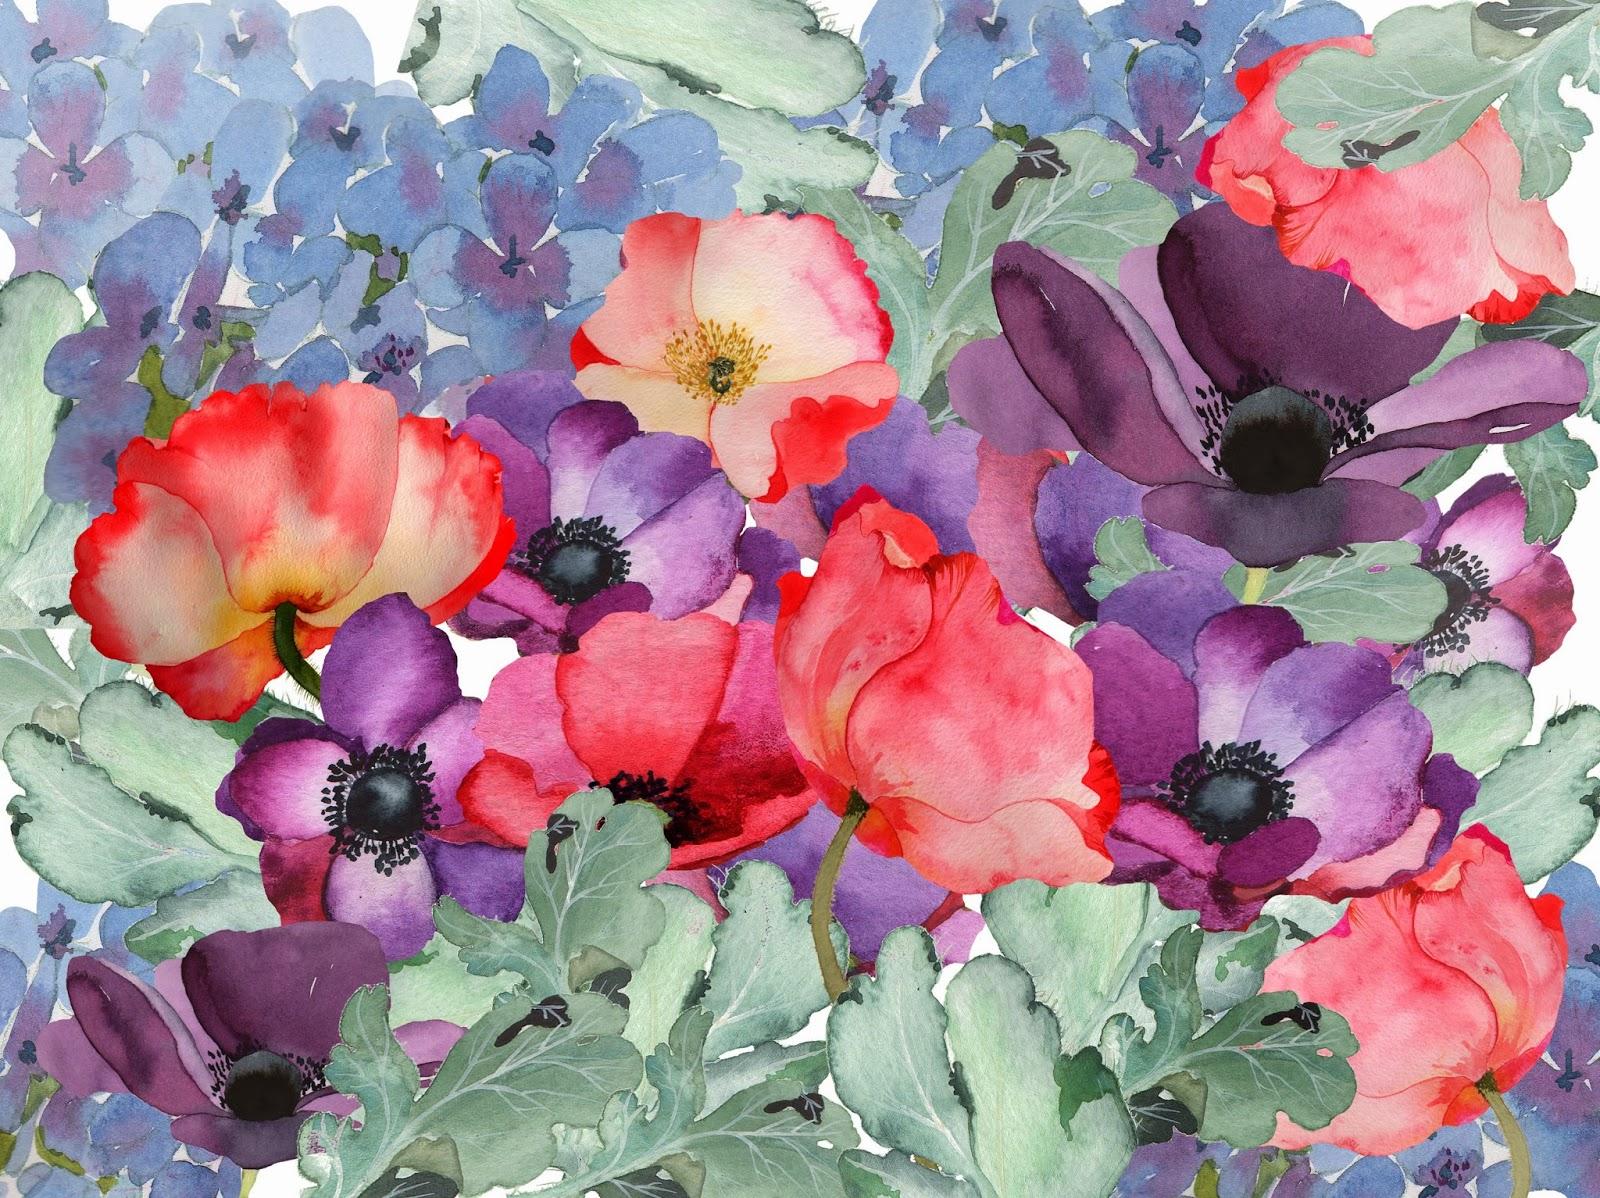 Beautiful art flower watercolor wallpaper hd 14 high - High resolution watercolor flowers ...